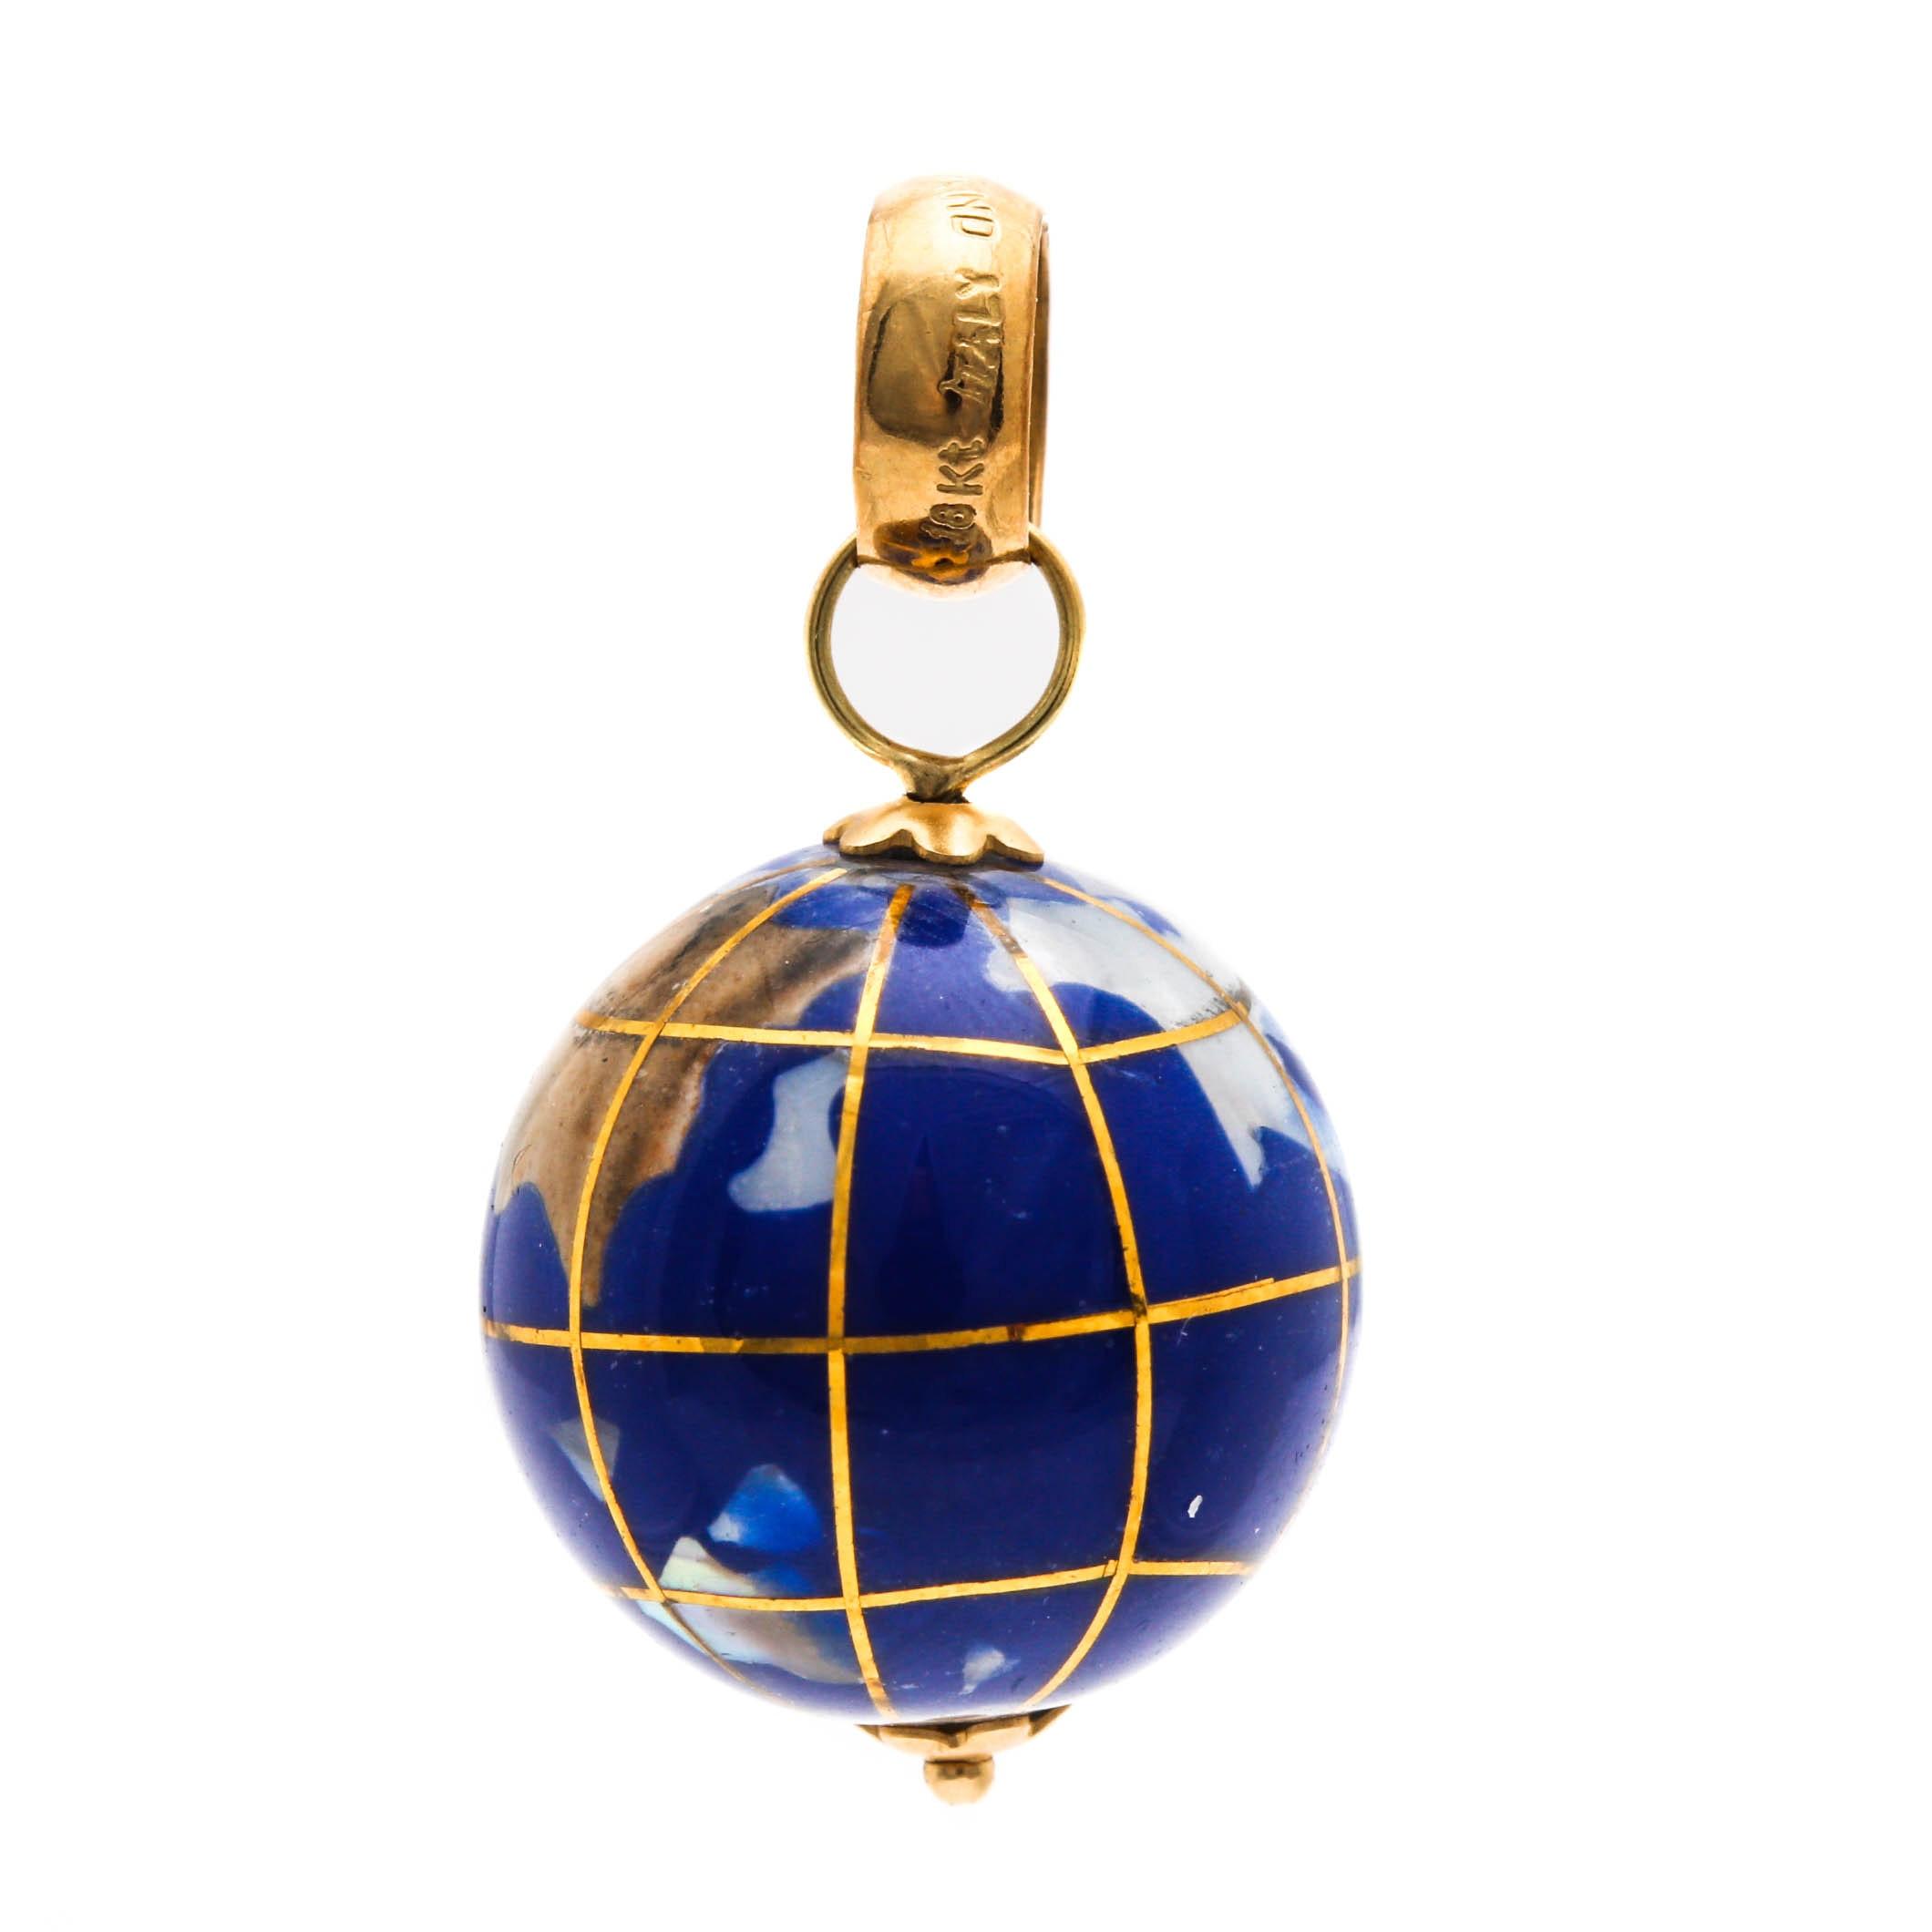 18K Yellow Gold Jasper, Mother of Pearl and Aventurine Globe Pendant